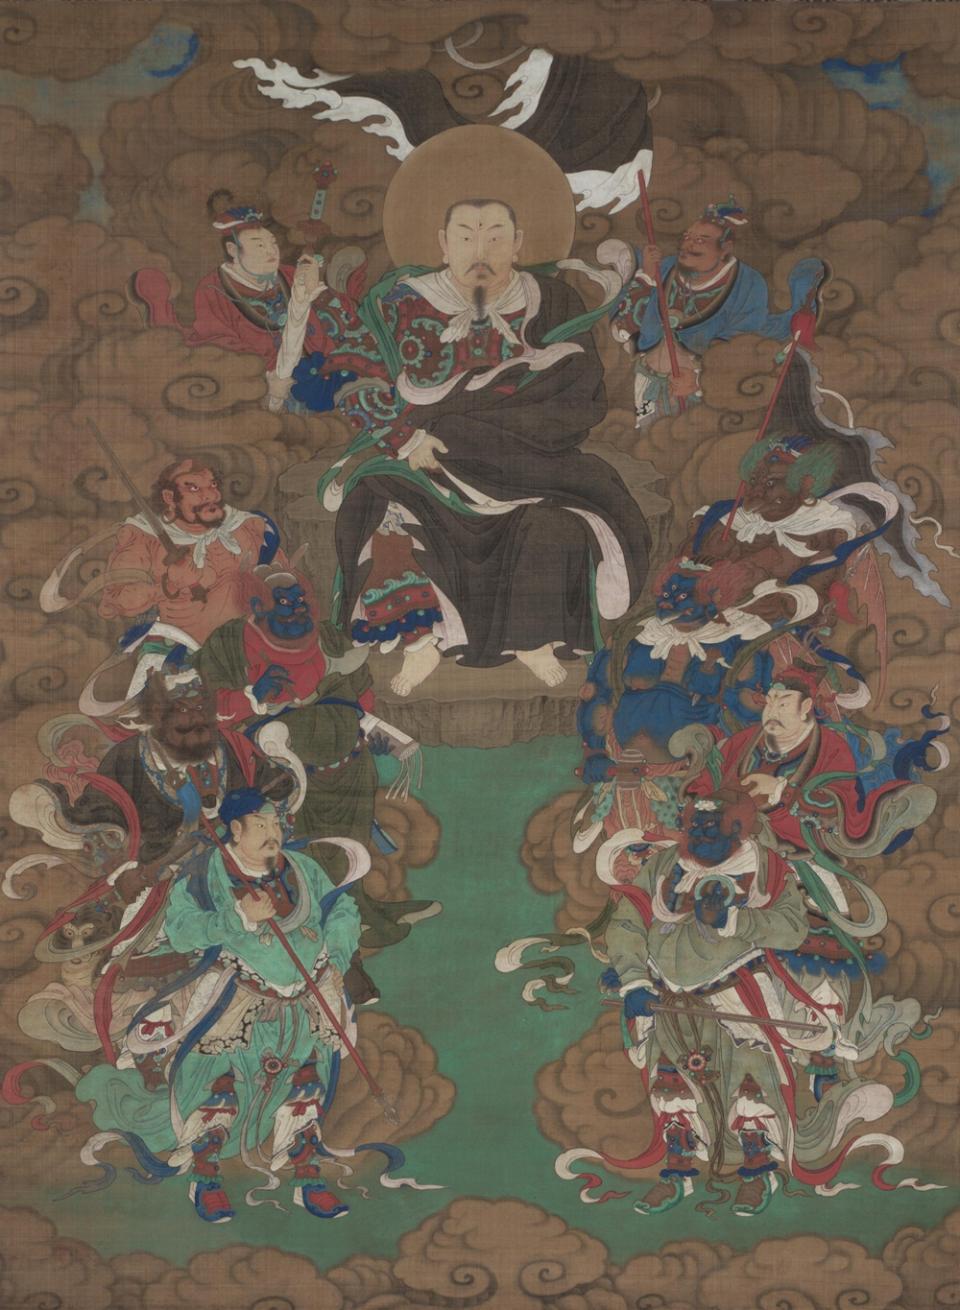 Zhenwu with an entourage of thunder marshals, early 15th century, Herbert F. Johnson Museum of Art, Cornell University